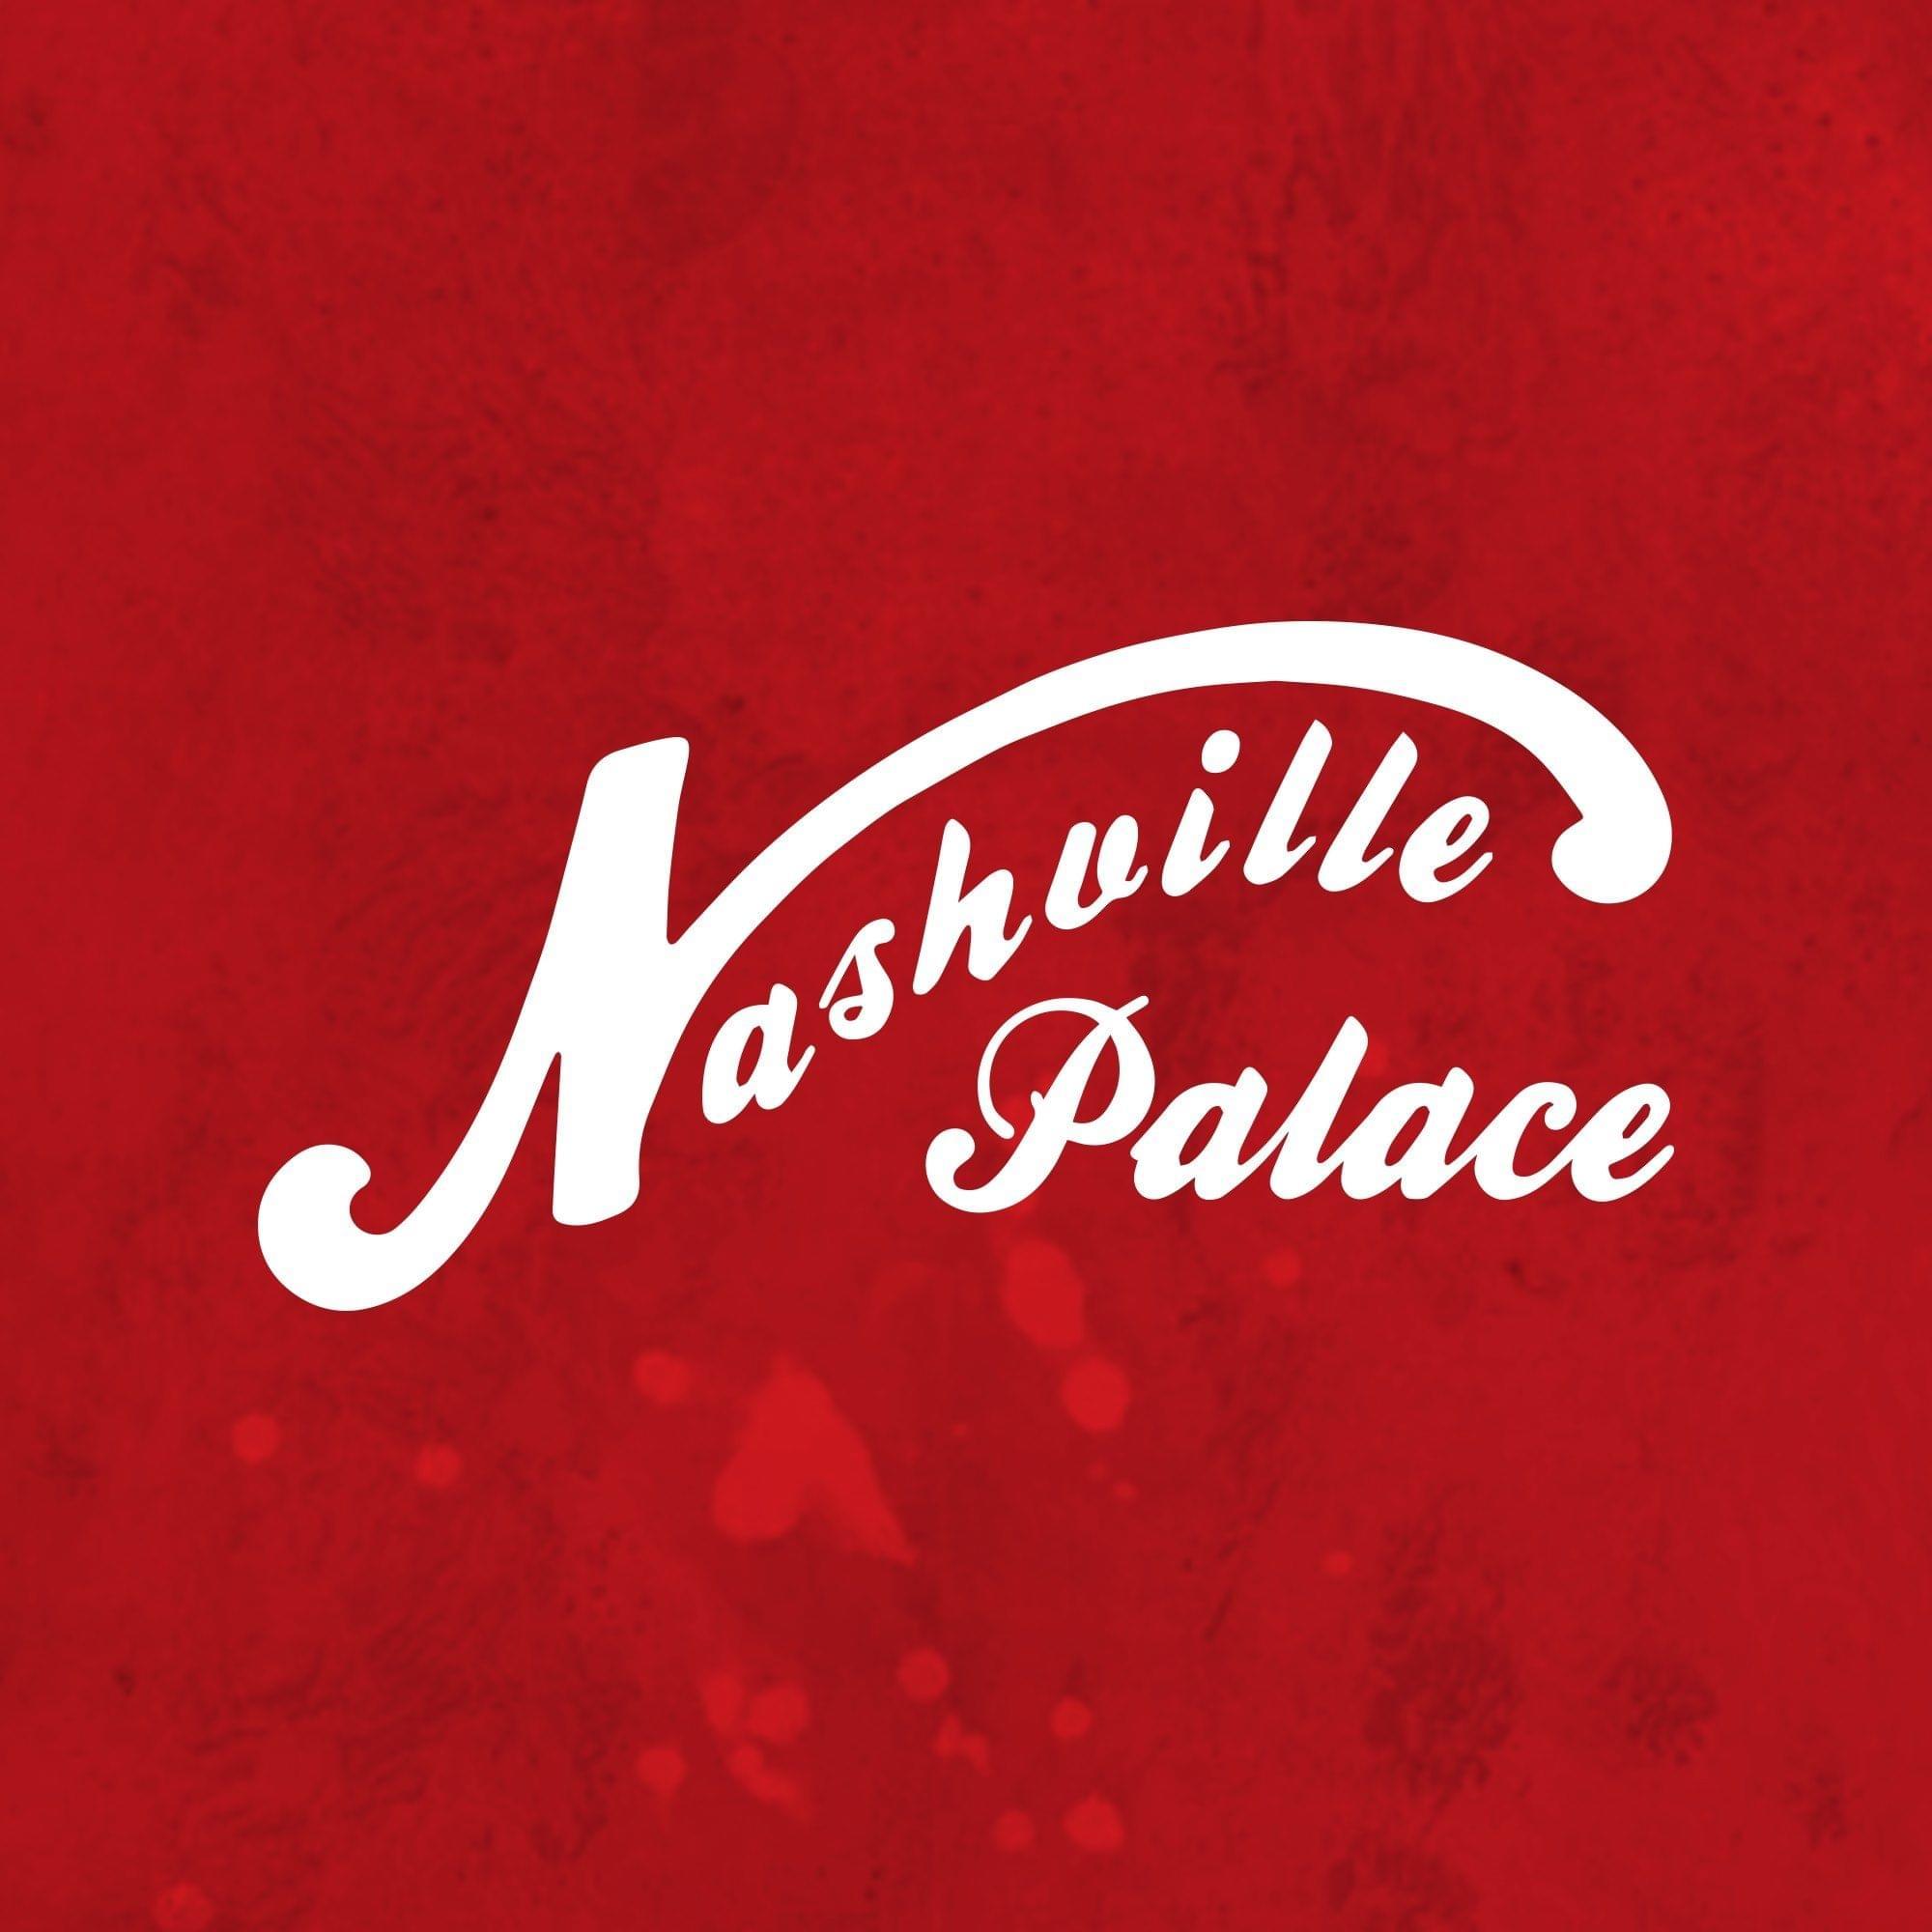 See Adam Hood on Friday at the Nashville Palace!